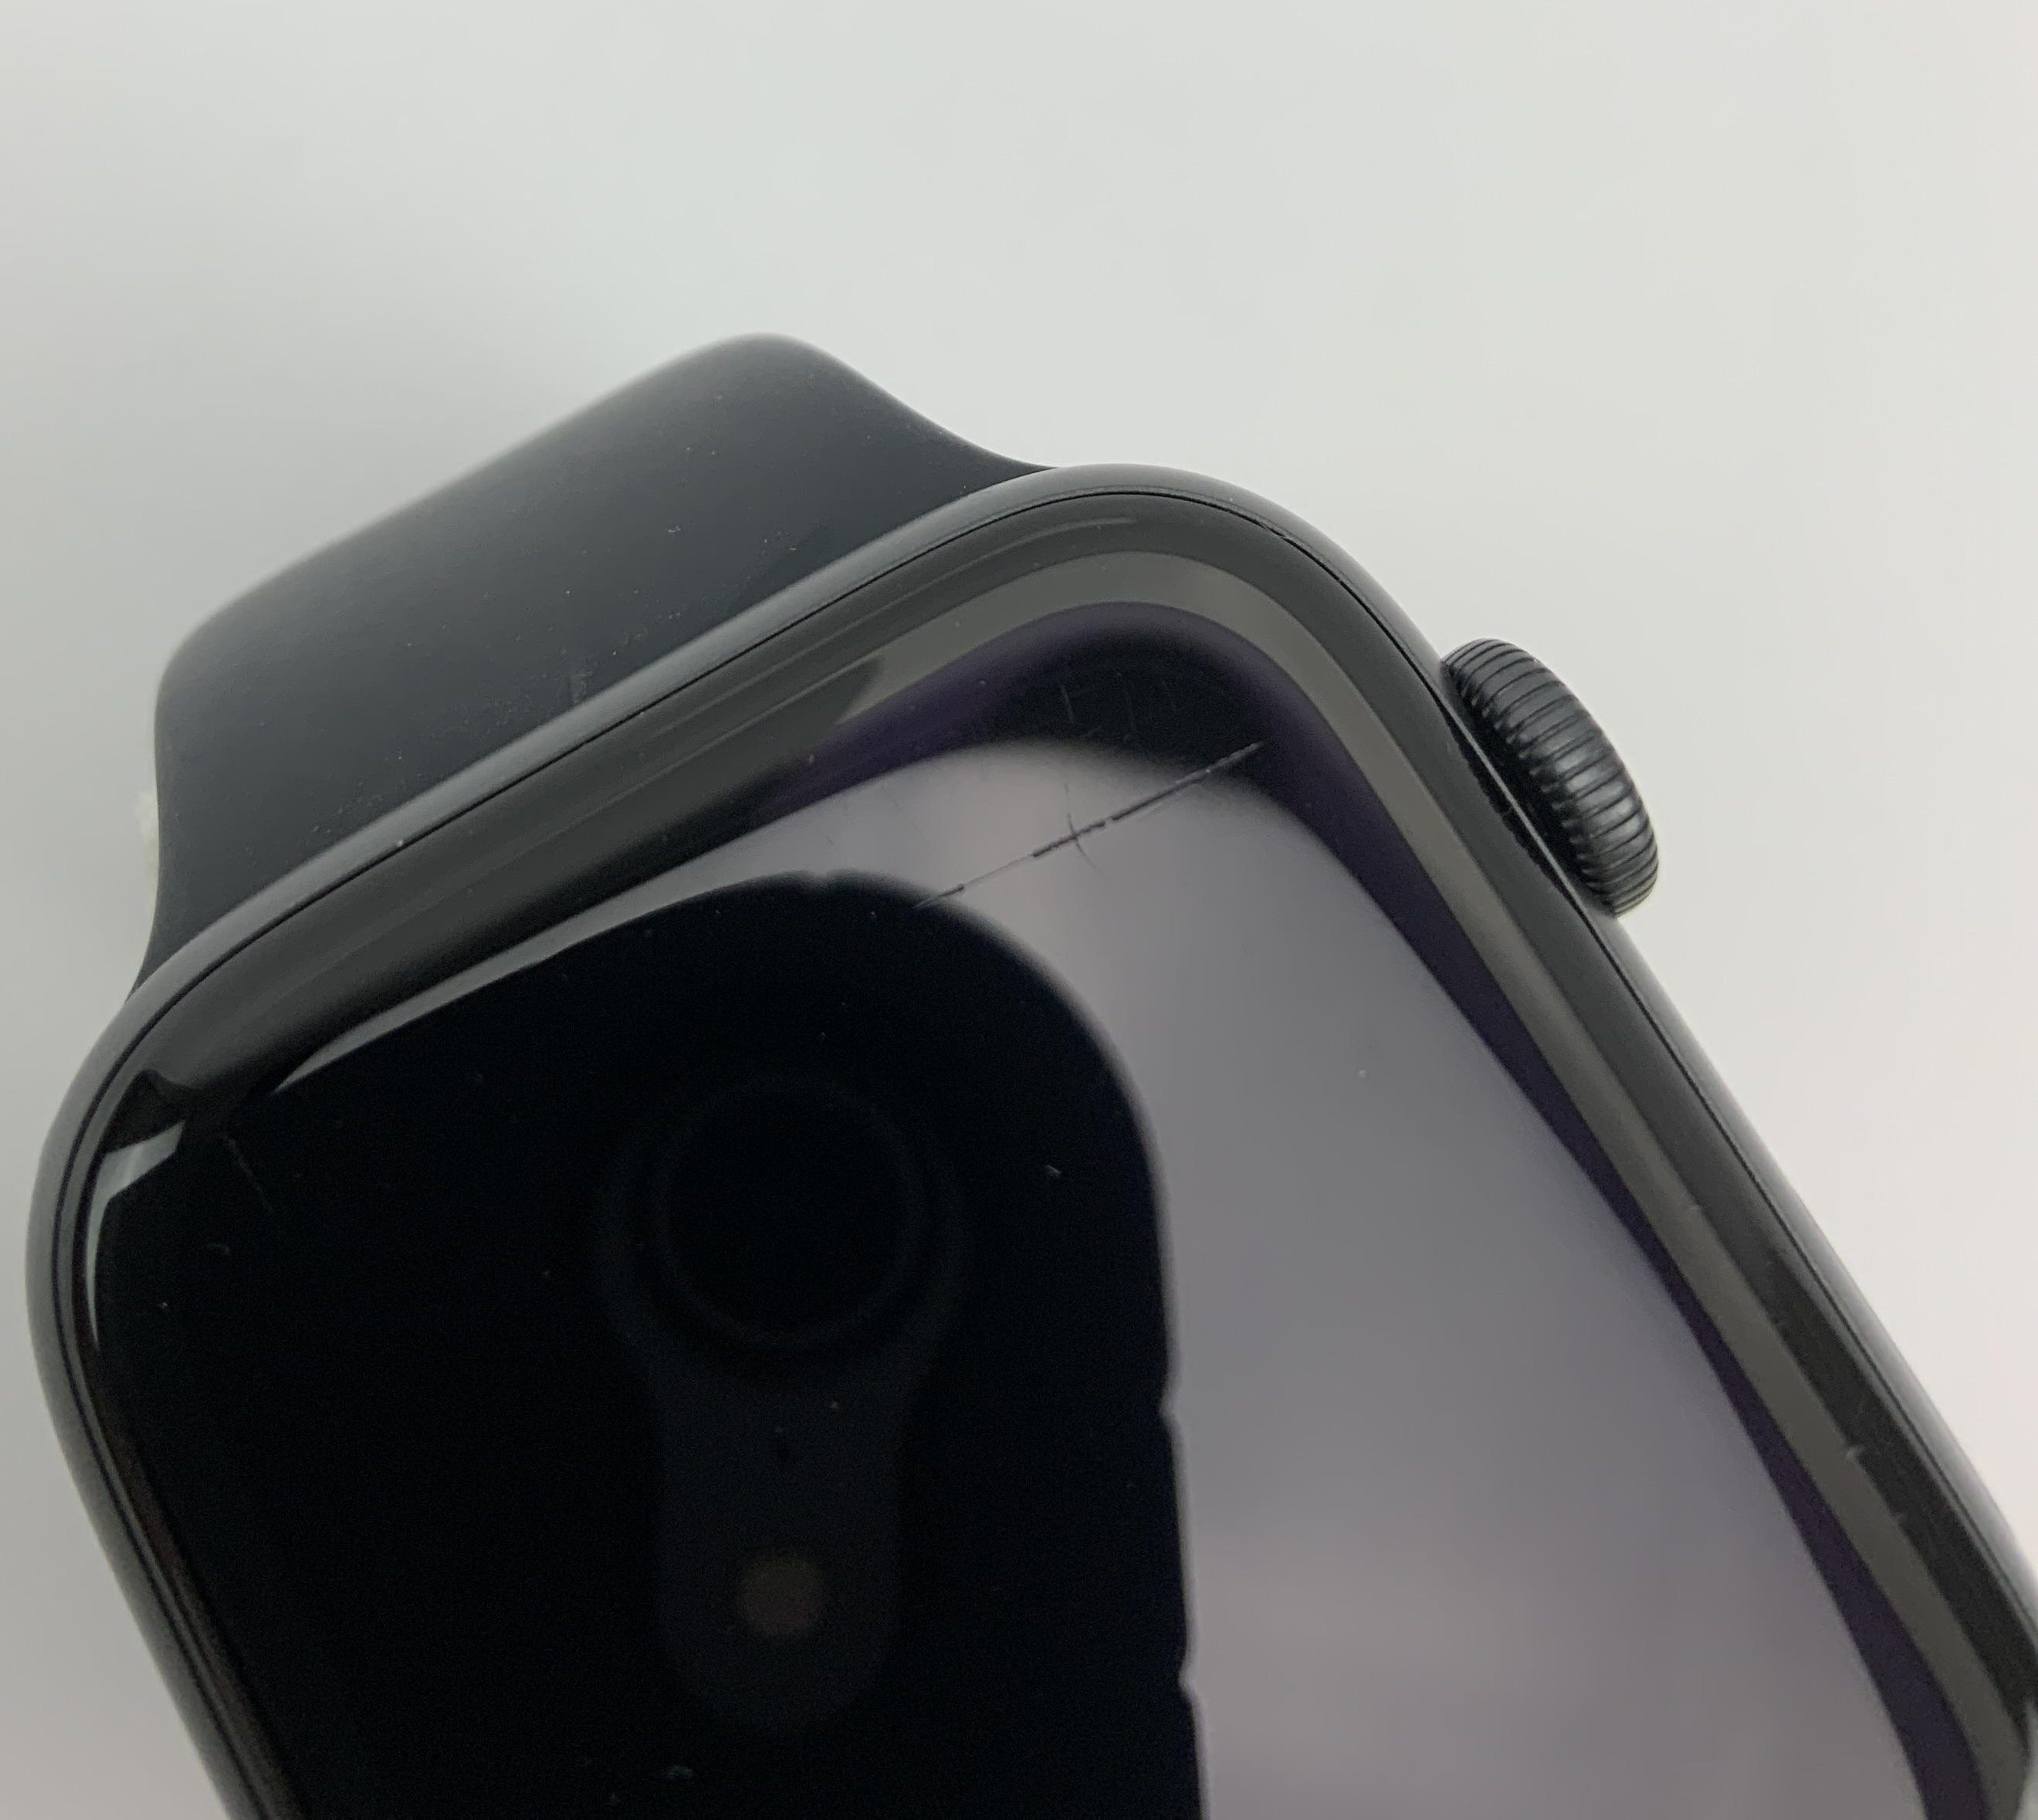 Watch Series 5 Aluminum Cellular (44mm), Space Gray, obraz 2